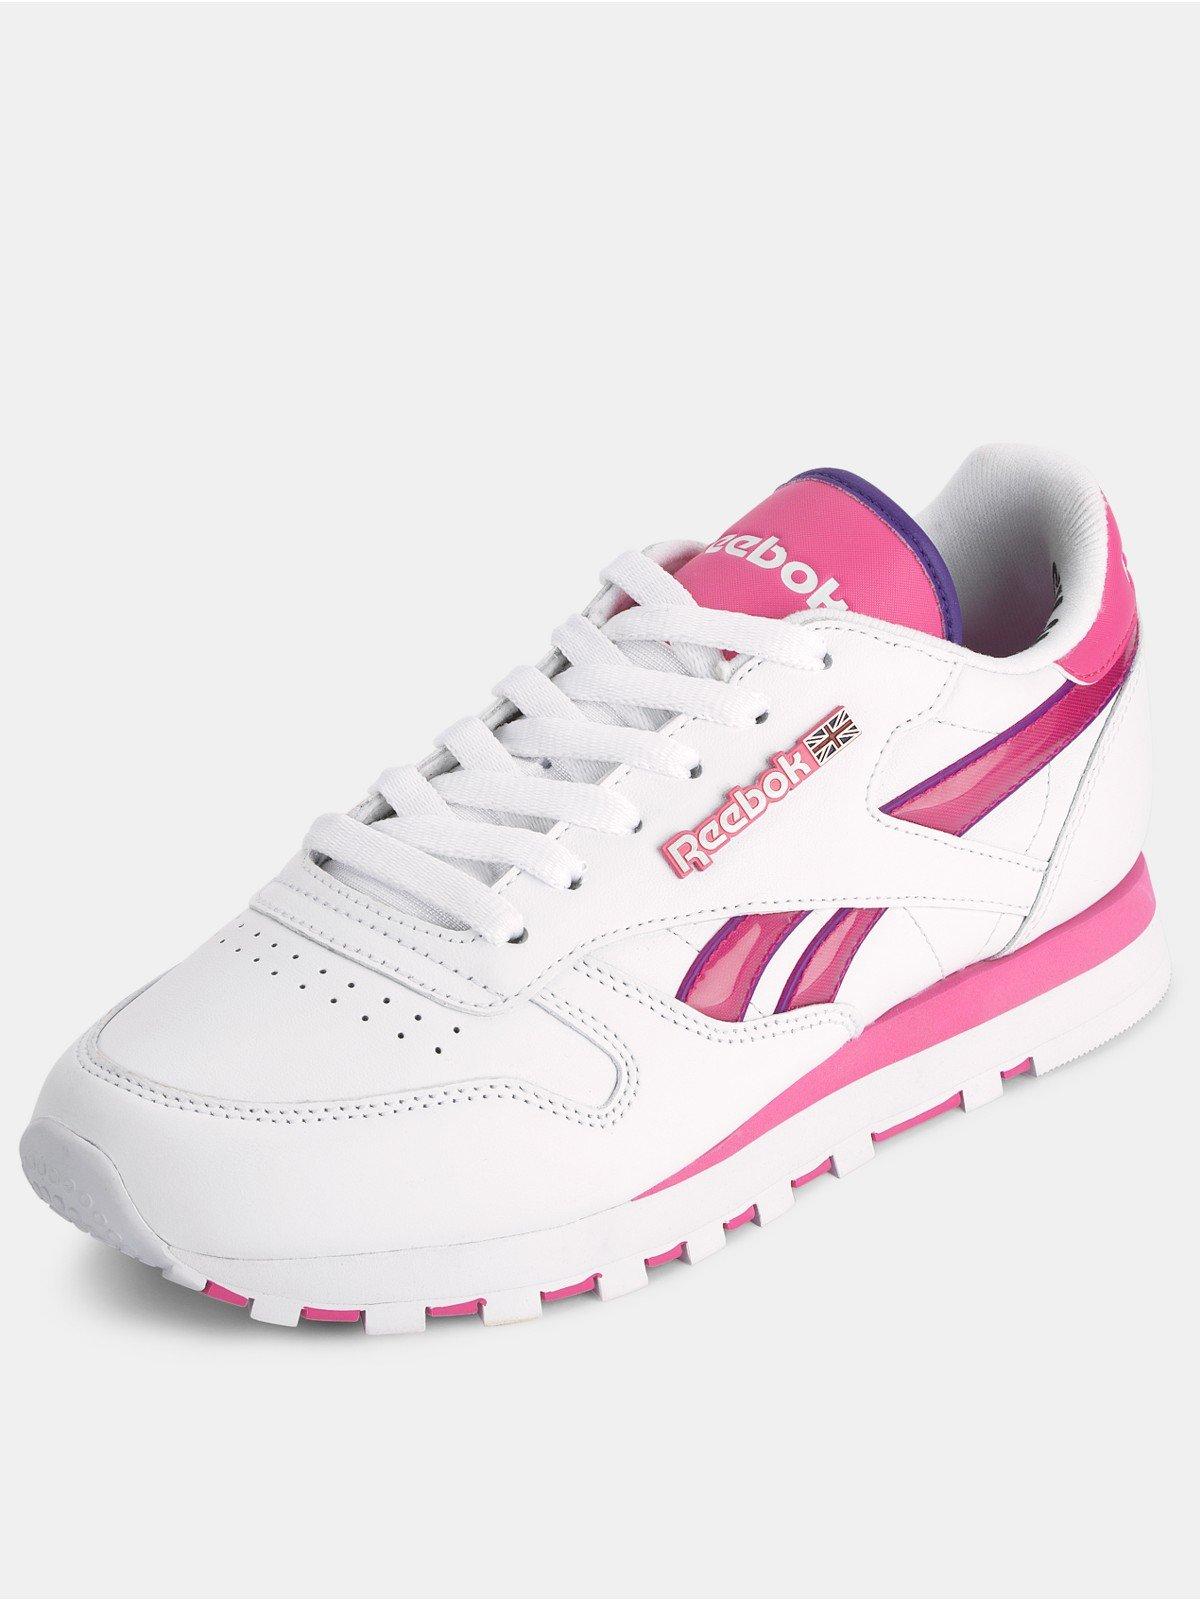 And Ireferyou Reebok co White uk Pink K3lc5TF1uJ